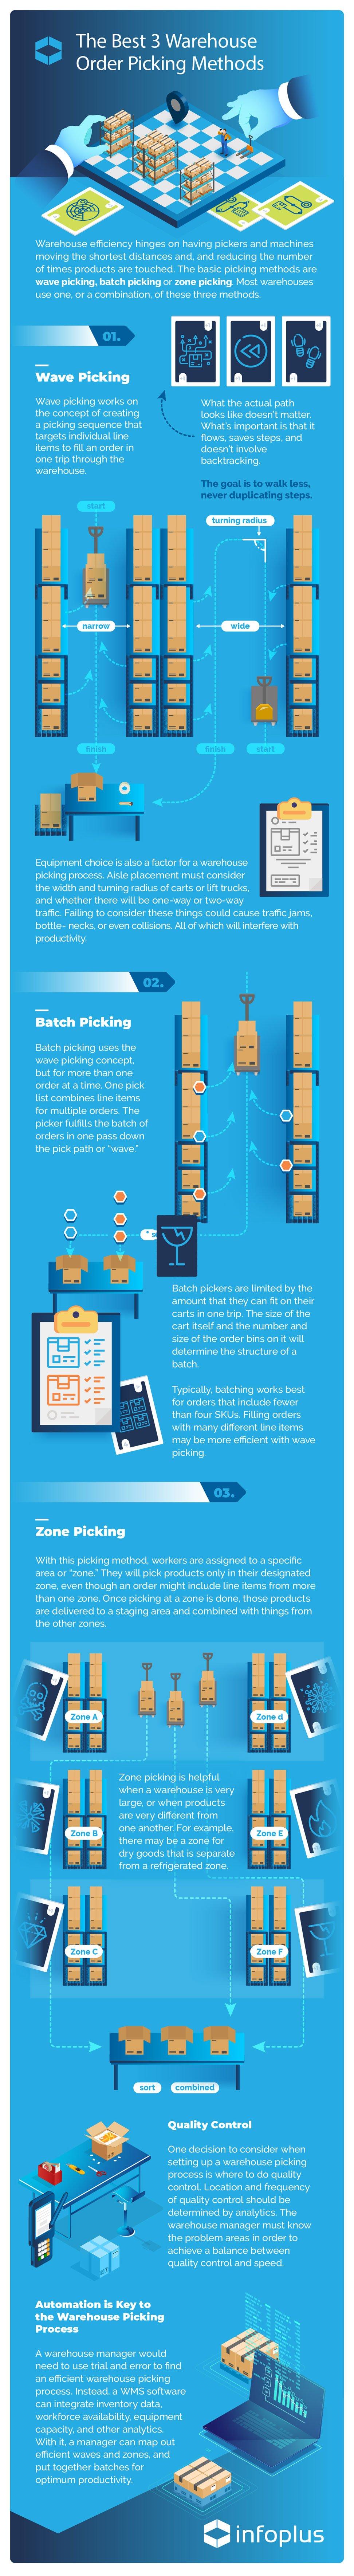 Best 3 Warehouse Order Picking Method Infographic